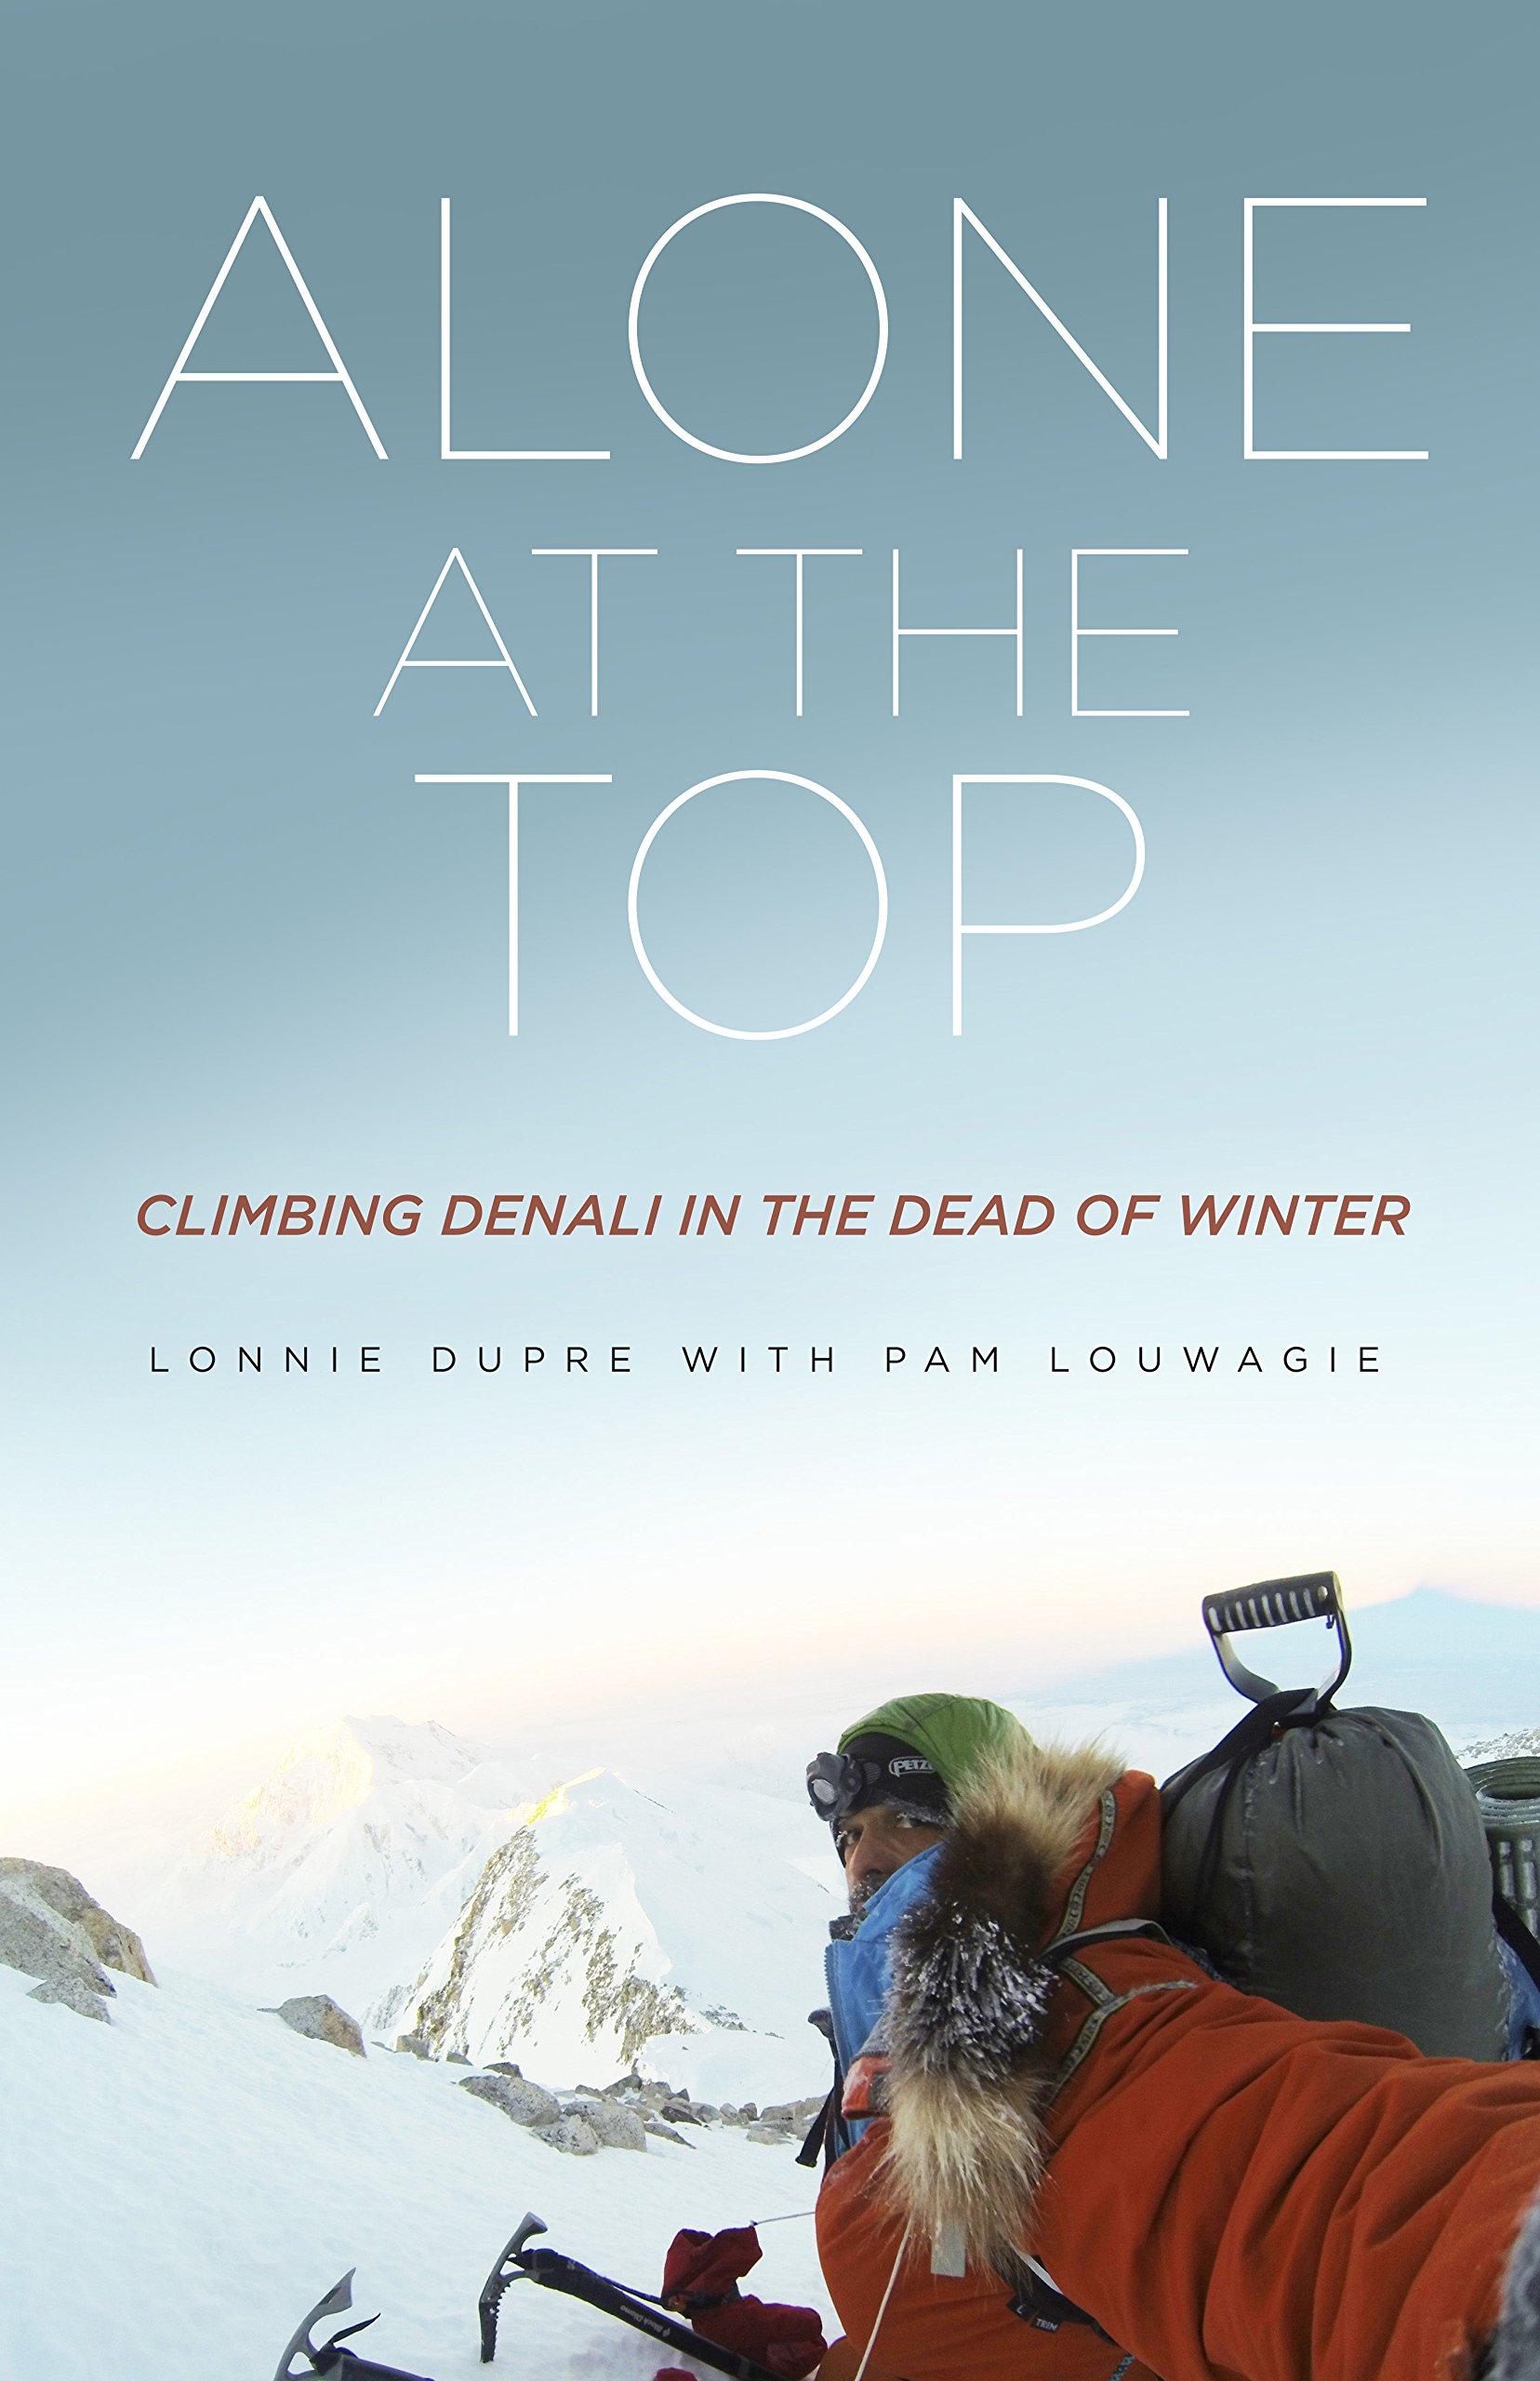 Adventurer Lonnie Dupre on his most recent book